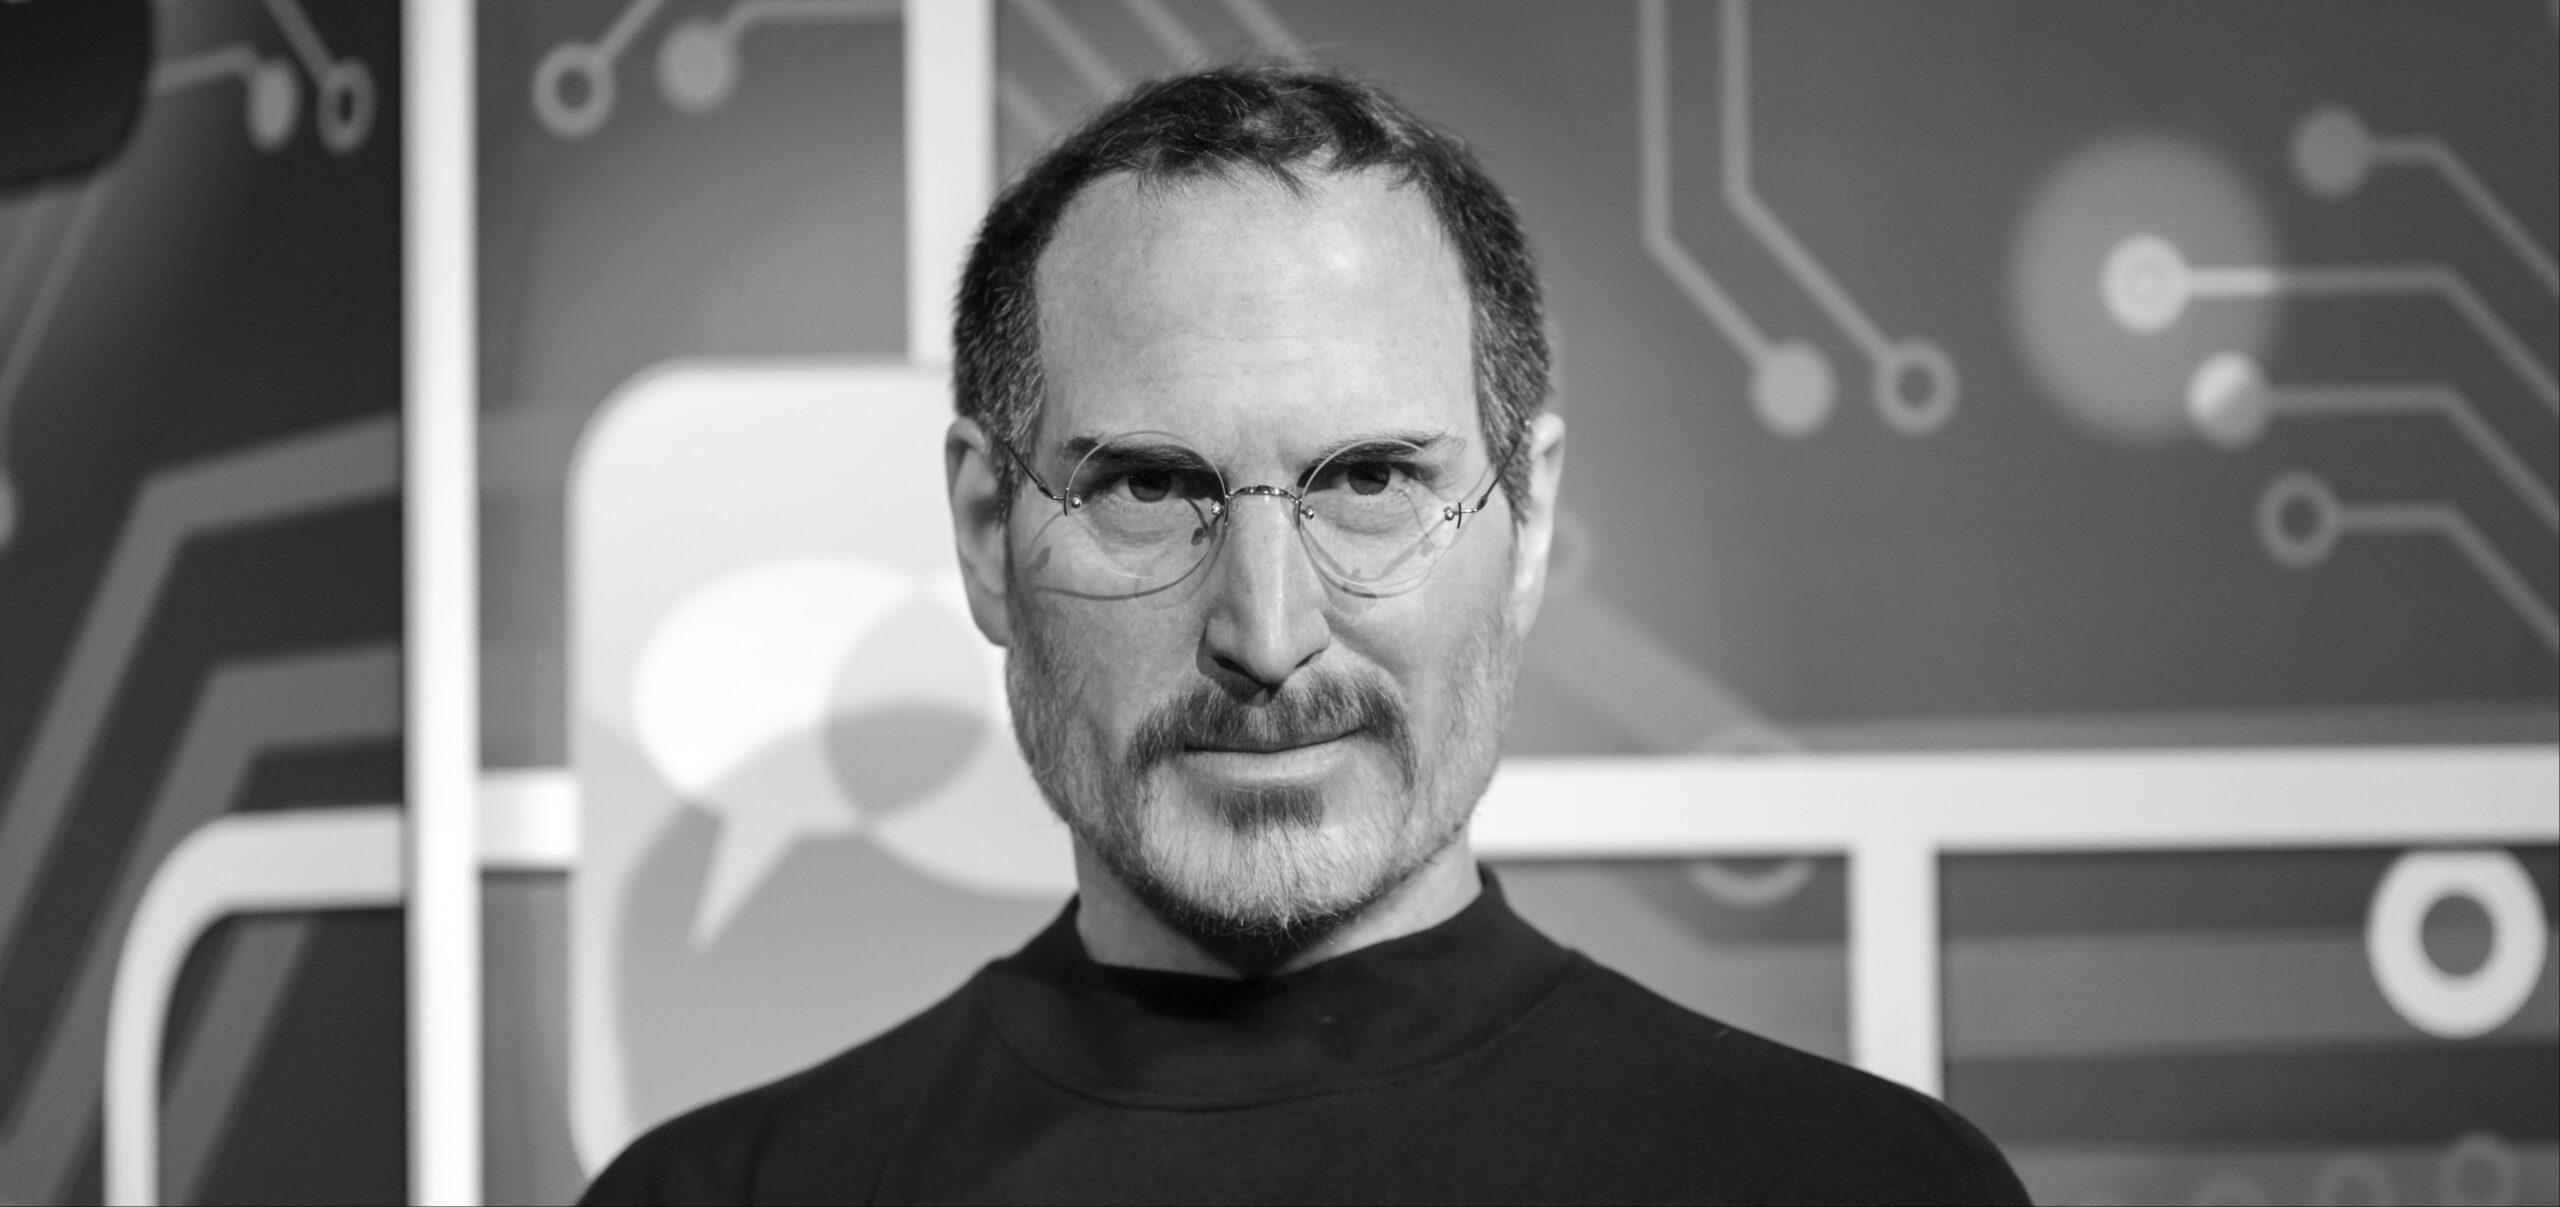 Inventores famosos, Steve Jobs